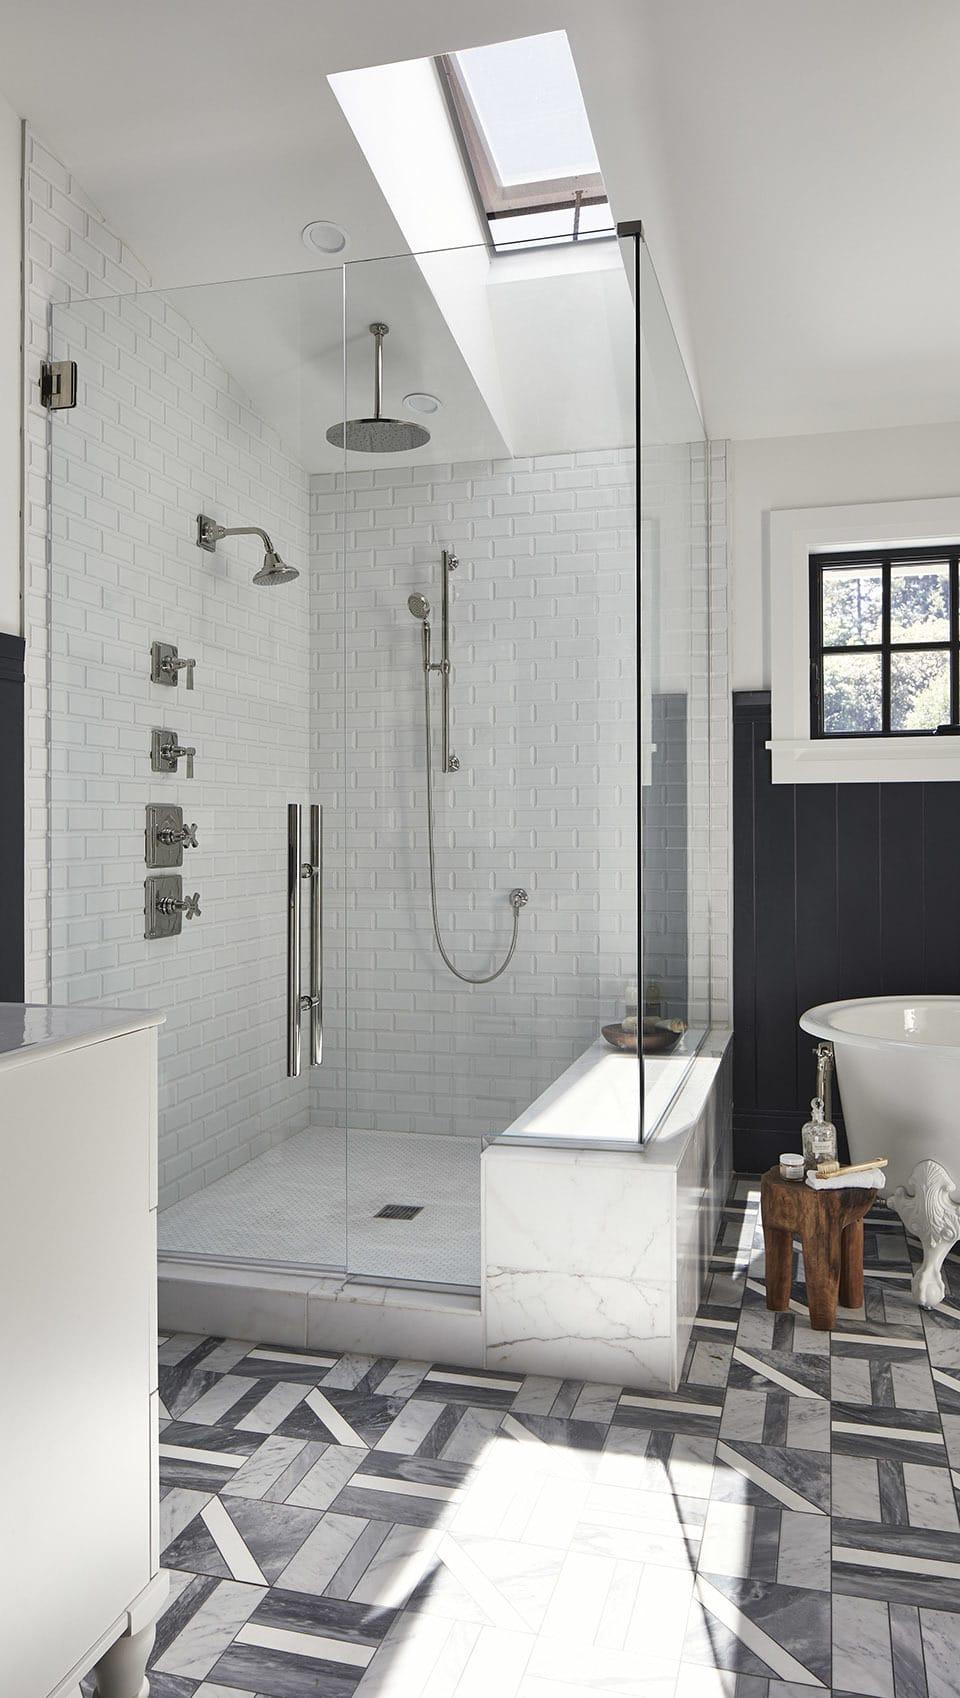 Bathroom_Showersml.jpg#asset:2199